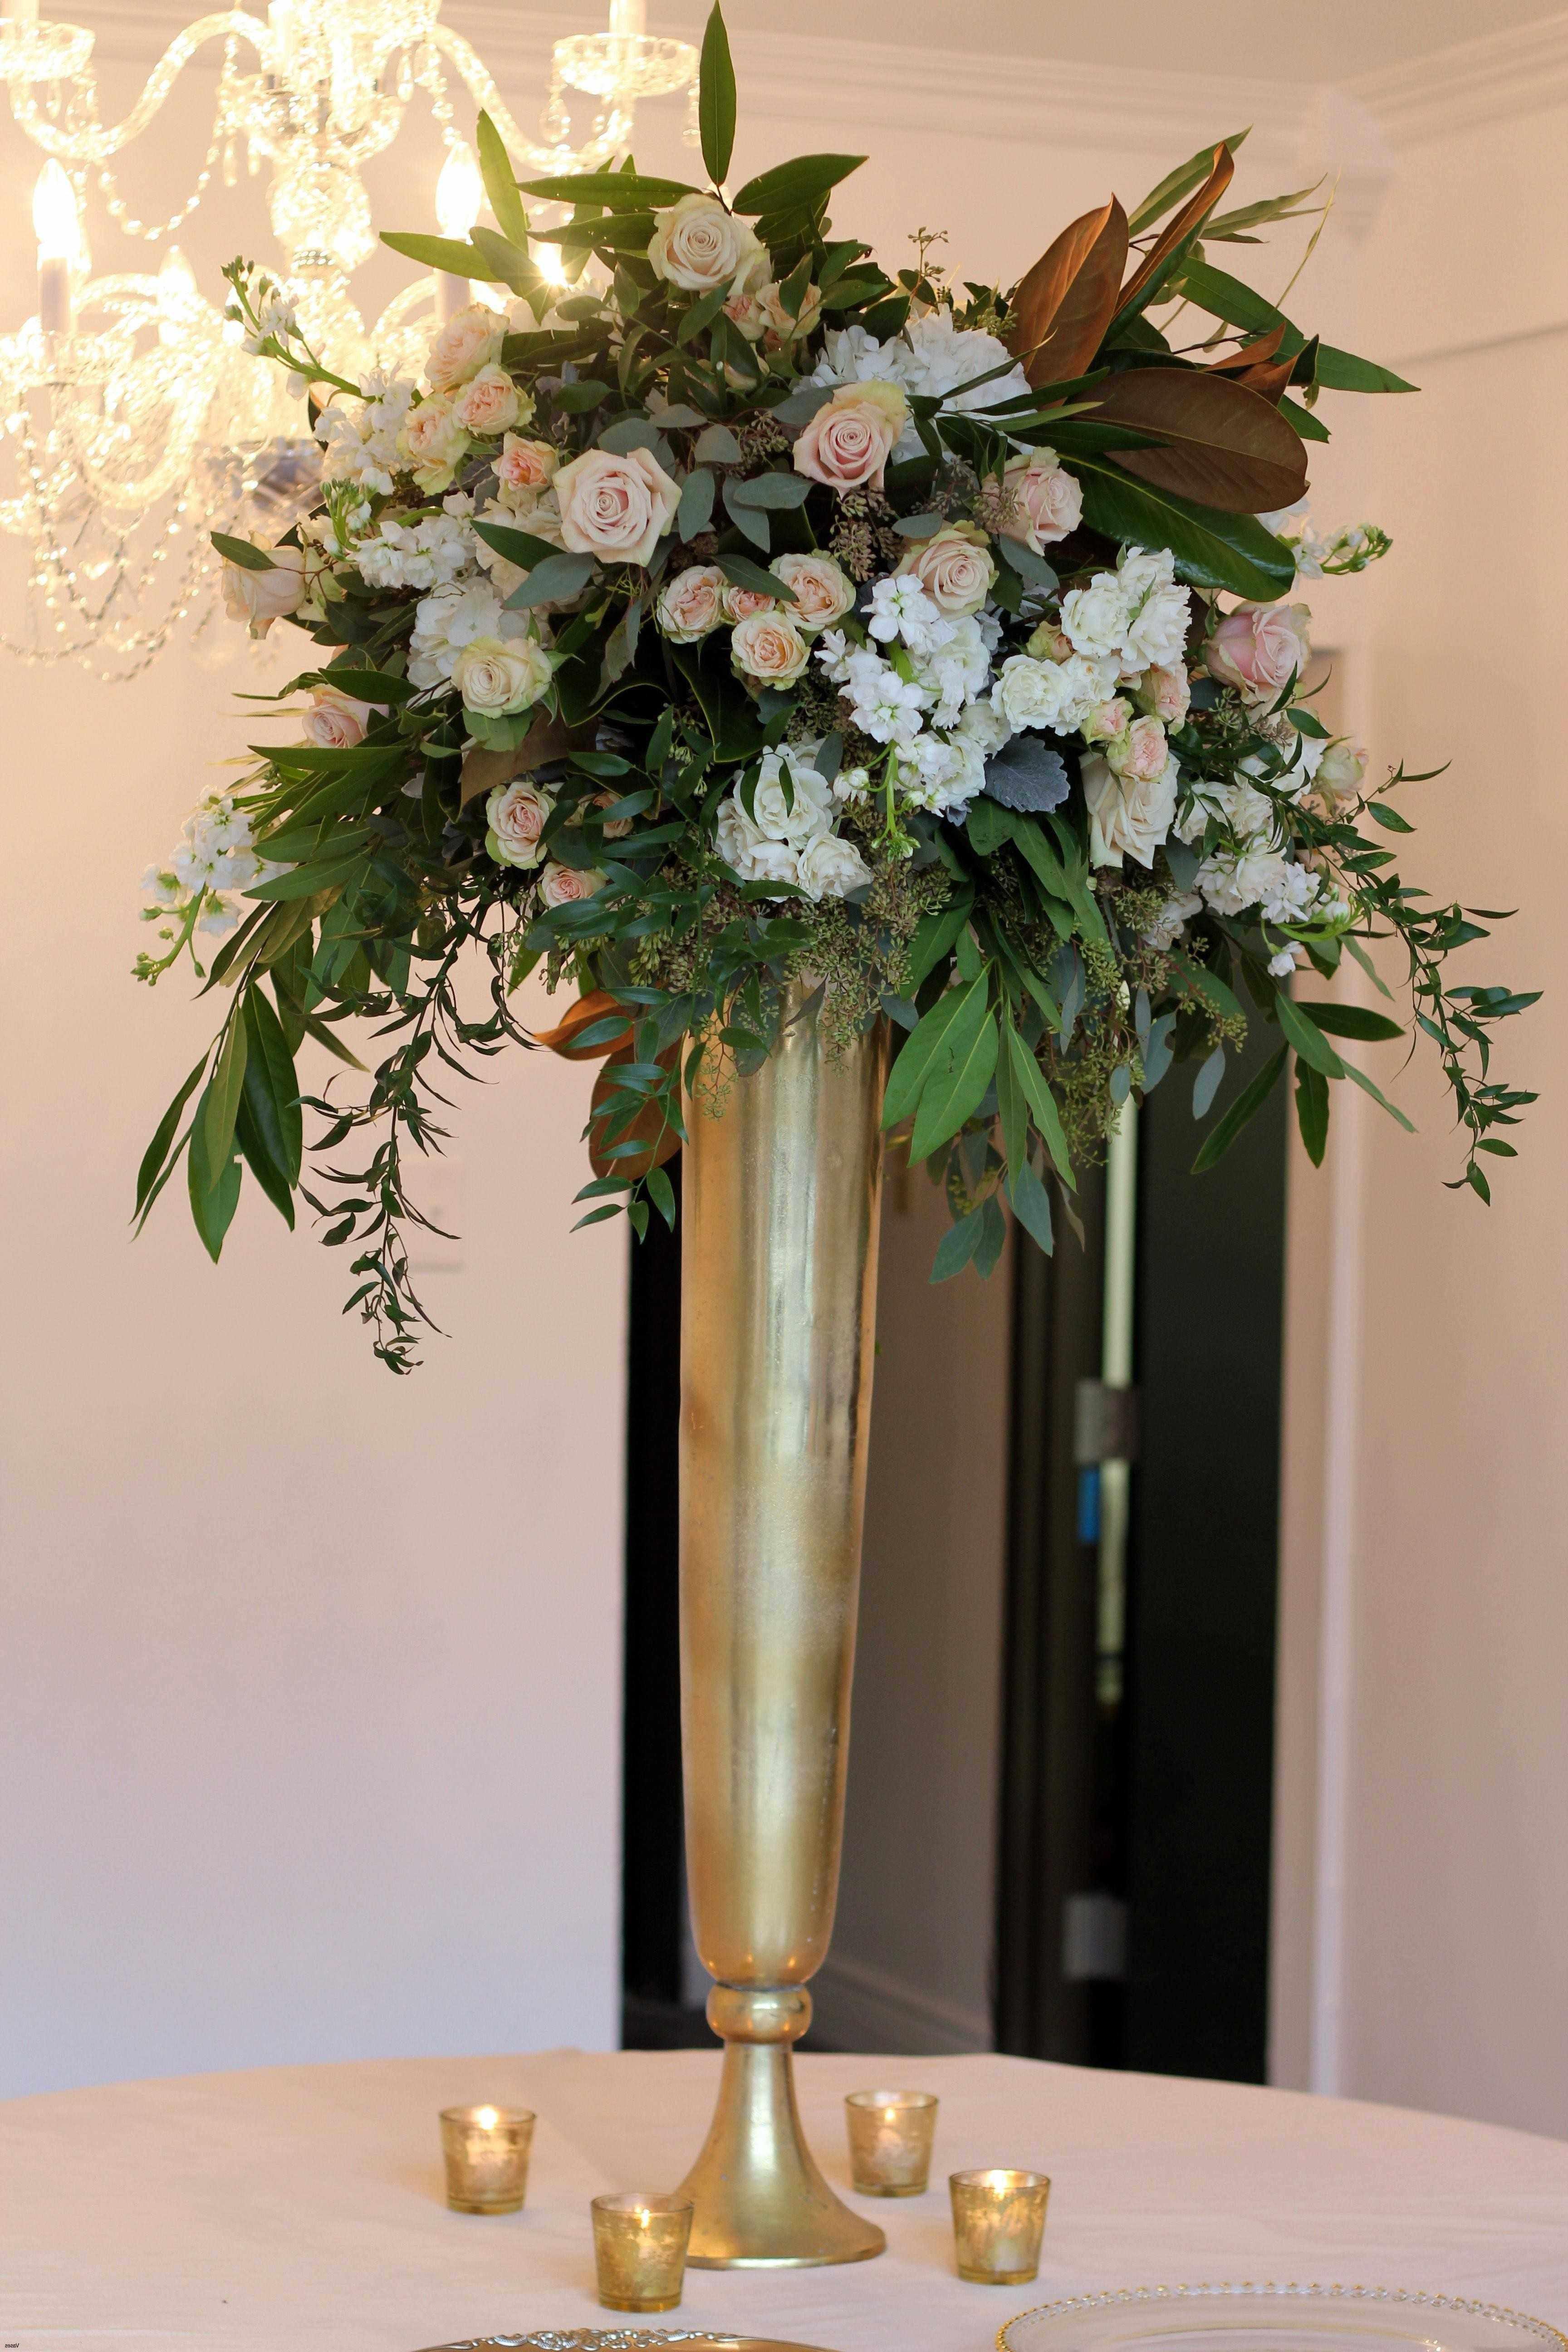 gold vases wedding of 15 beautiful rose gold vases bulk bogekompresorturkiye com for bulk wedding flowers new living room gold vases bulk luxury nautical centerpieceh vases 60 inspirational